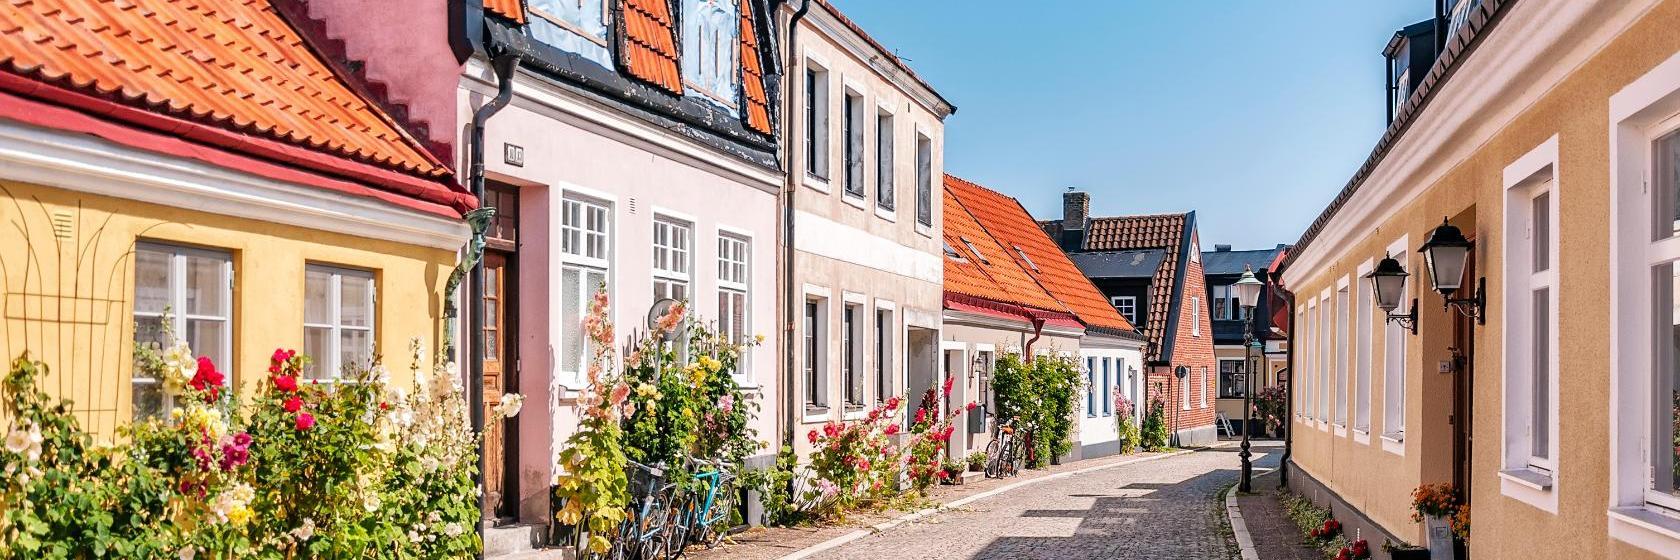 10 Best Ystad Hotels, Sweden (From $86)